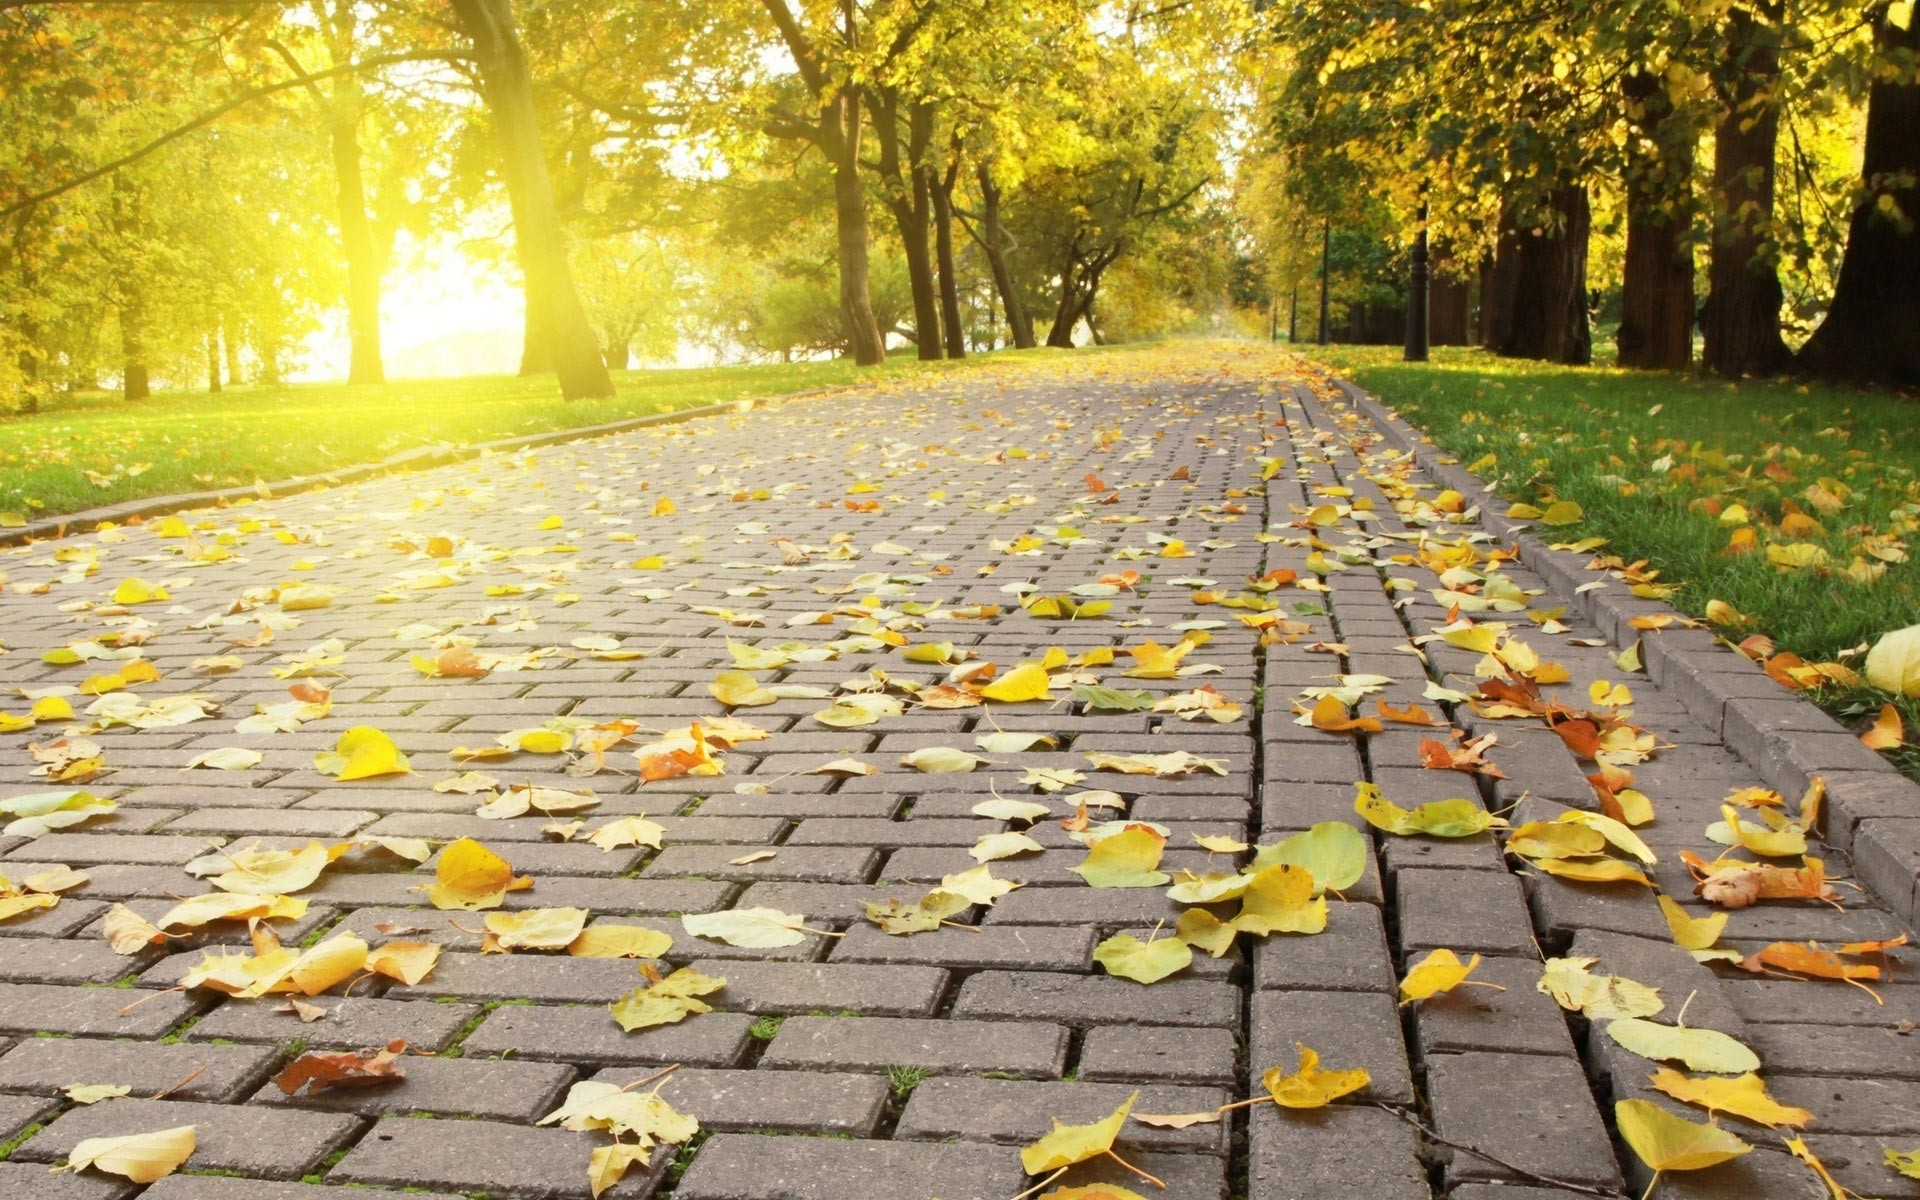 HD Wallpapers > Nature & Landscape > Autumn Widescreen HD Wallpapers .